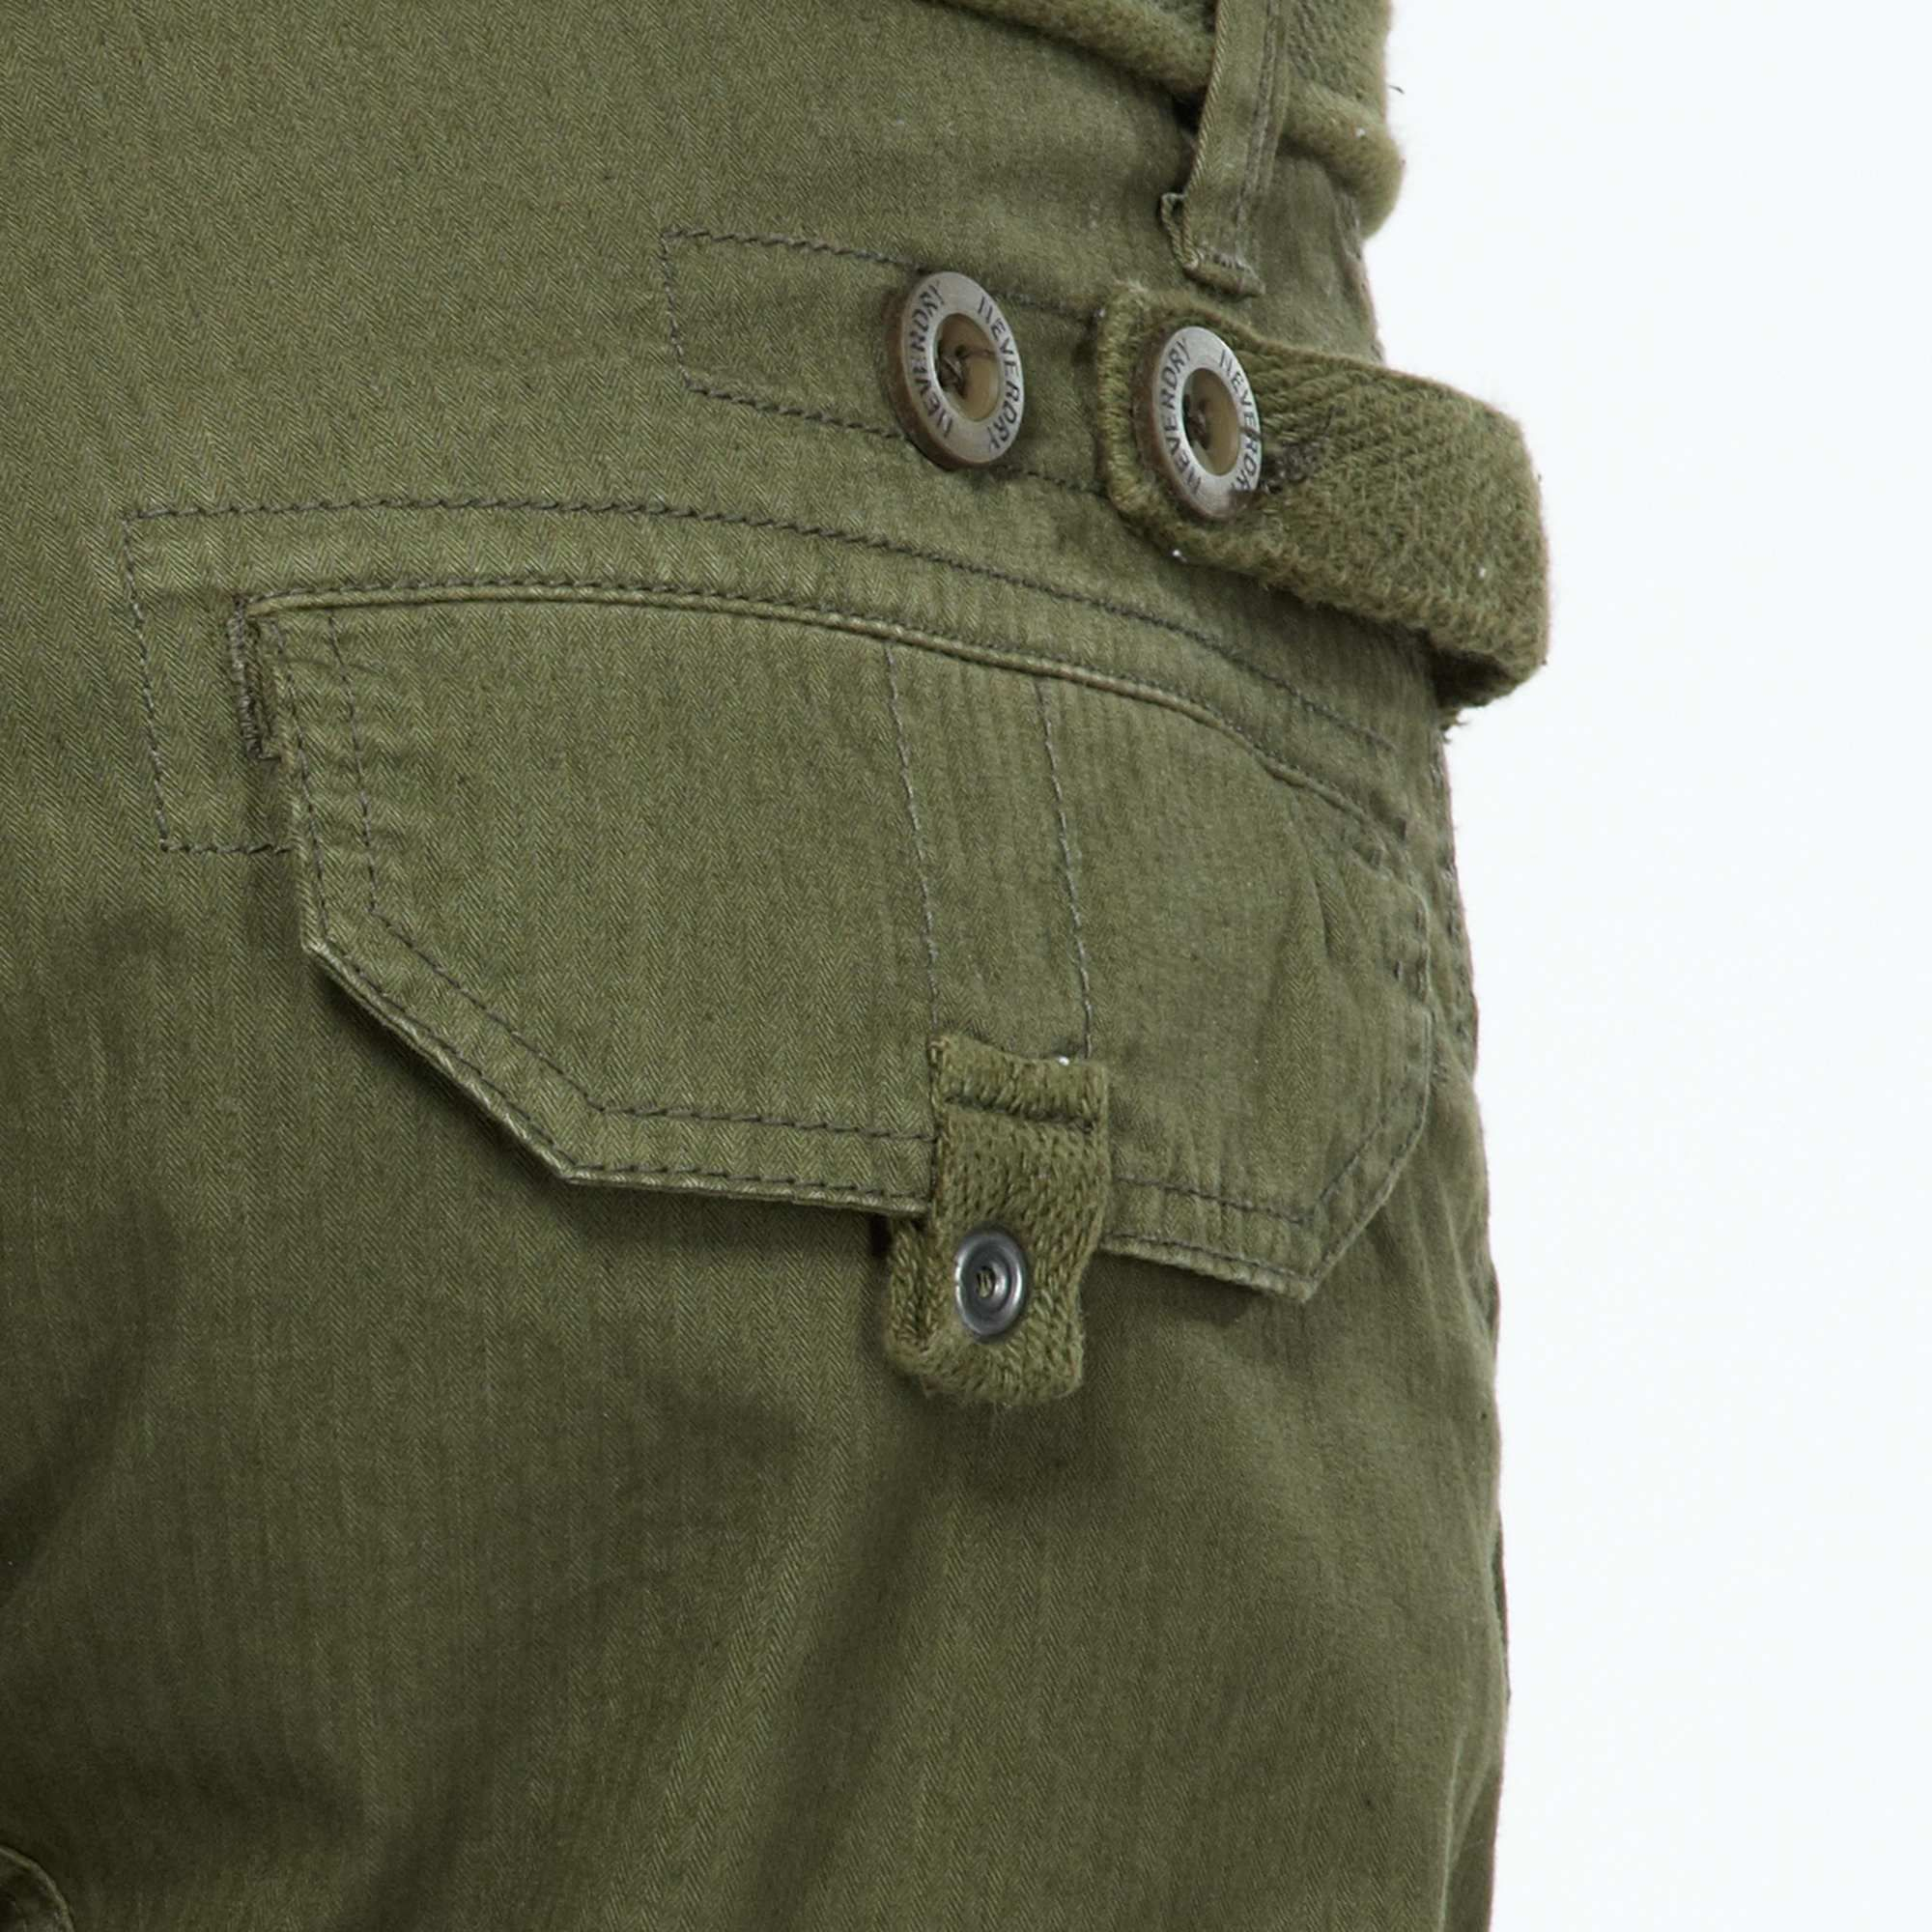 très loué vente en ligne garantie de haute qualité Pantalón tipo cargo 'Neverdry' + cinturón correa Hombre ...